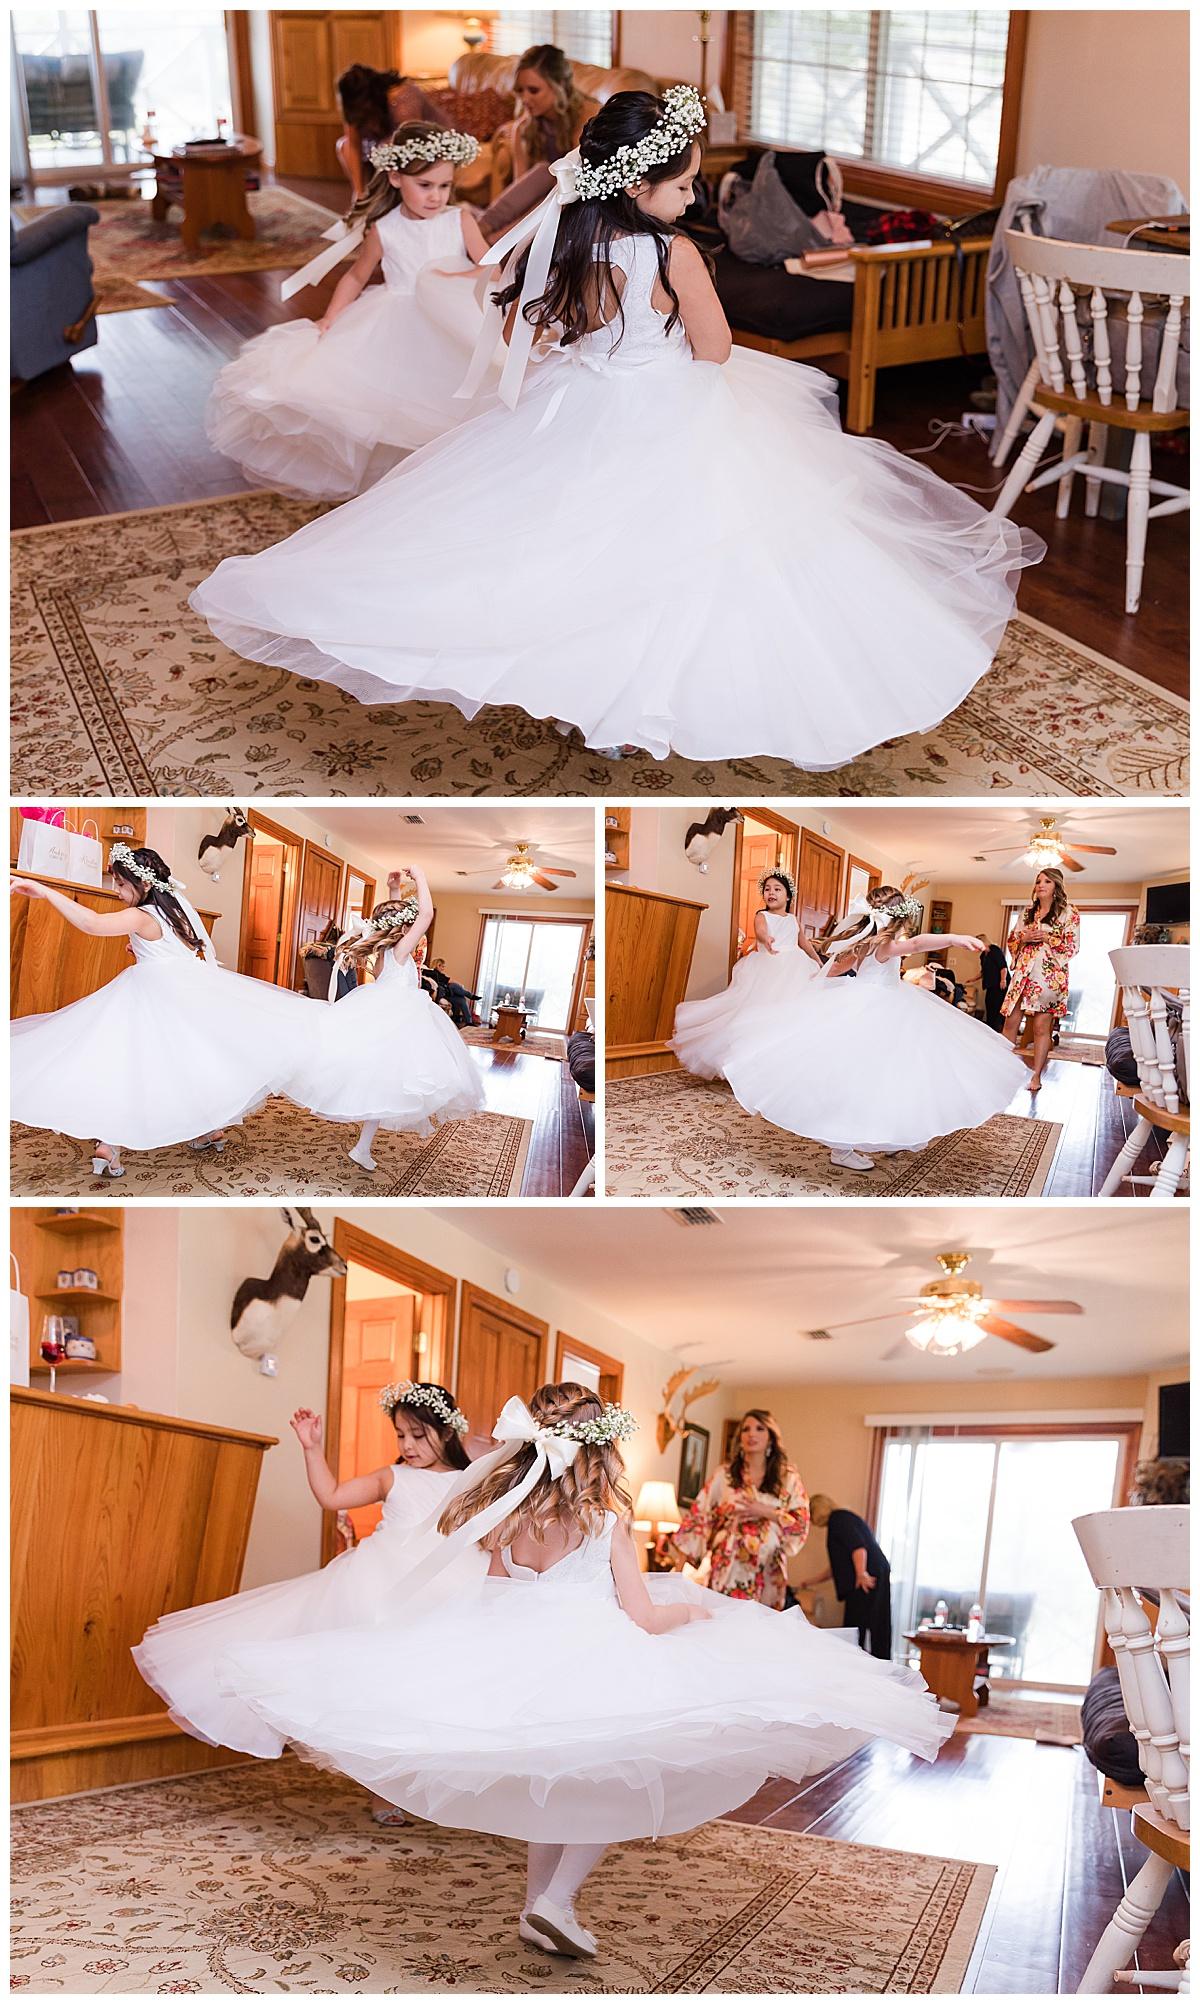 Wedding-Photographer-Texas-Hill-Country-Happy-H-Ranch-Comfor-Texas-Carly-Barton-Photography_0012.jpg